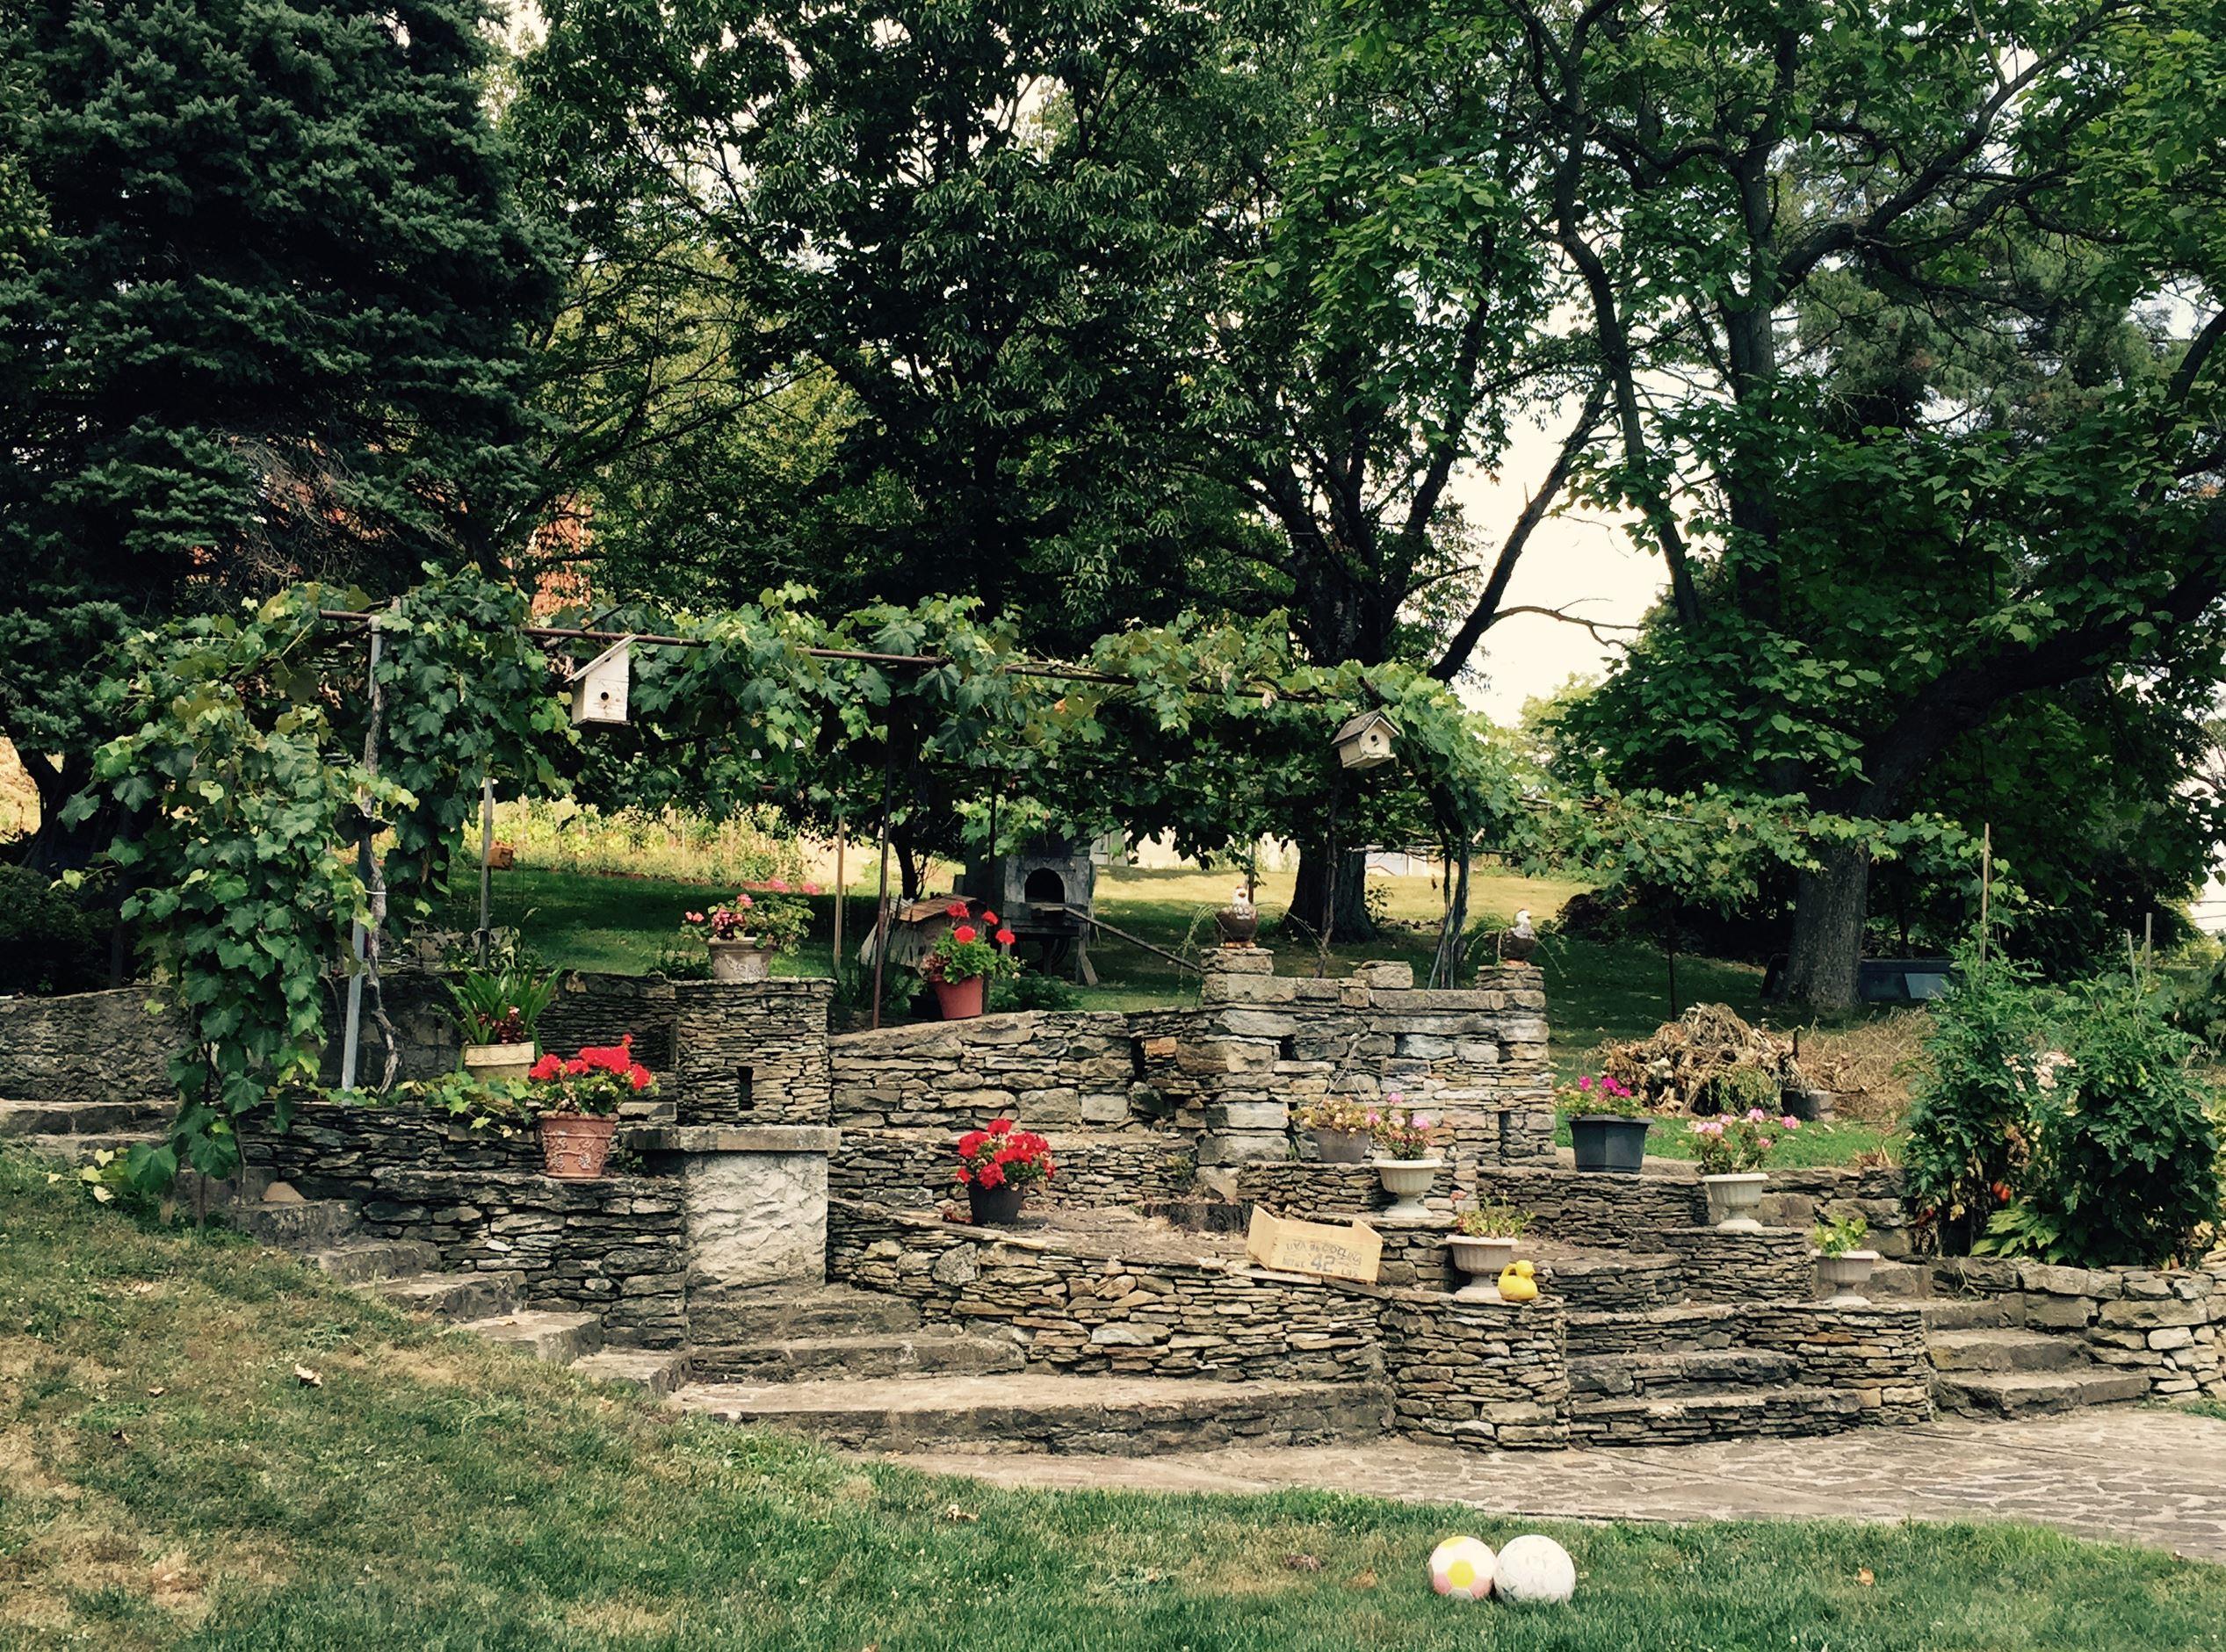 italiangardenB-1 Domenico Carpico built his Jefferson Hills garden by hand.